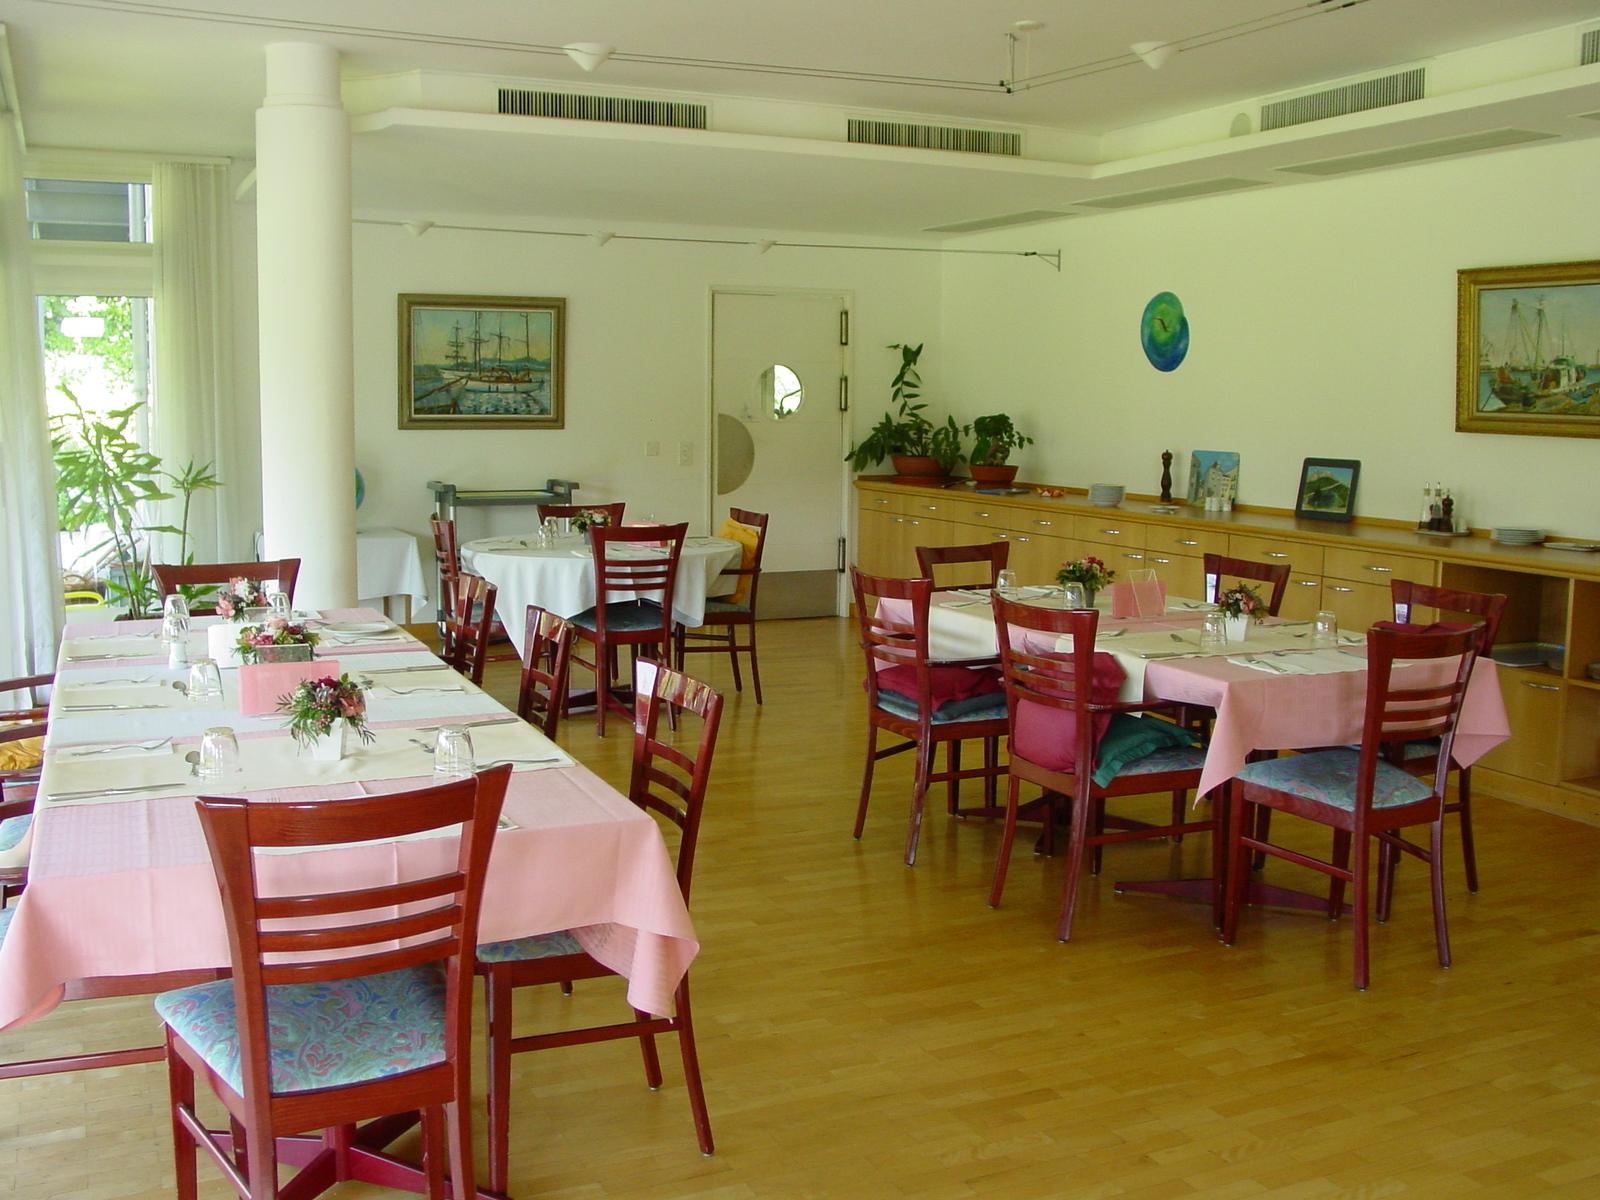 Le-Verger-Dinning-room.jpg